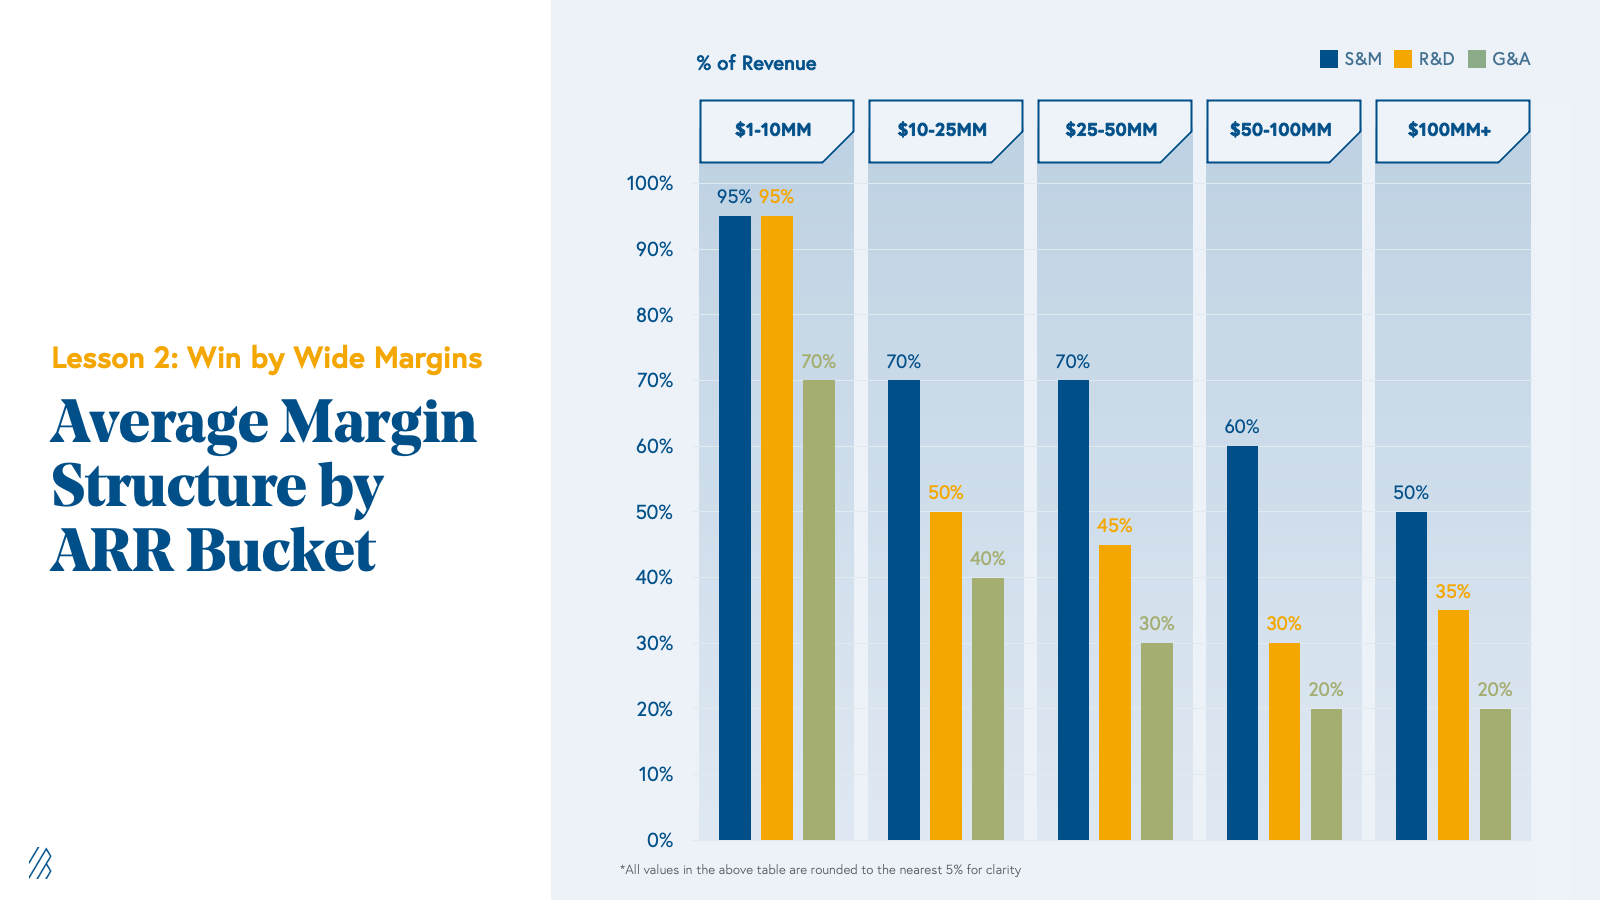 Average Margin Structure by ARR Bucket Chart